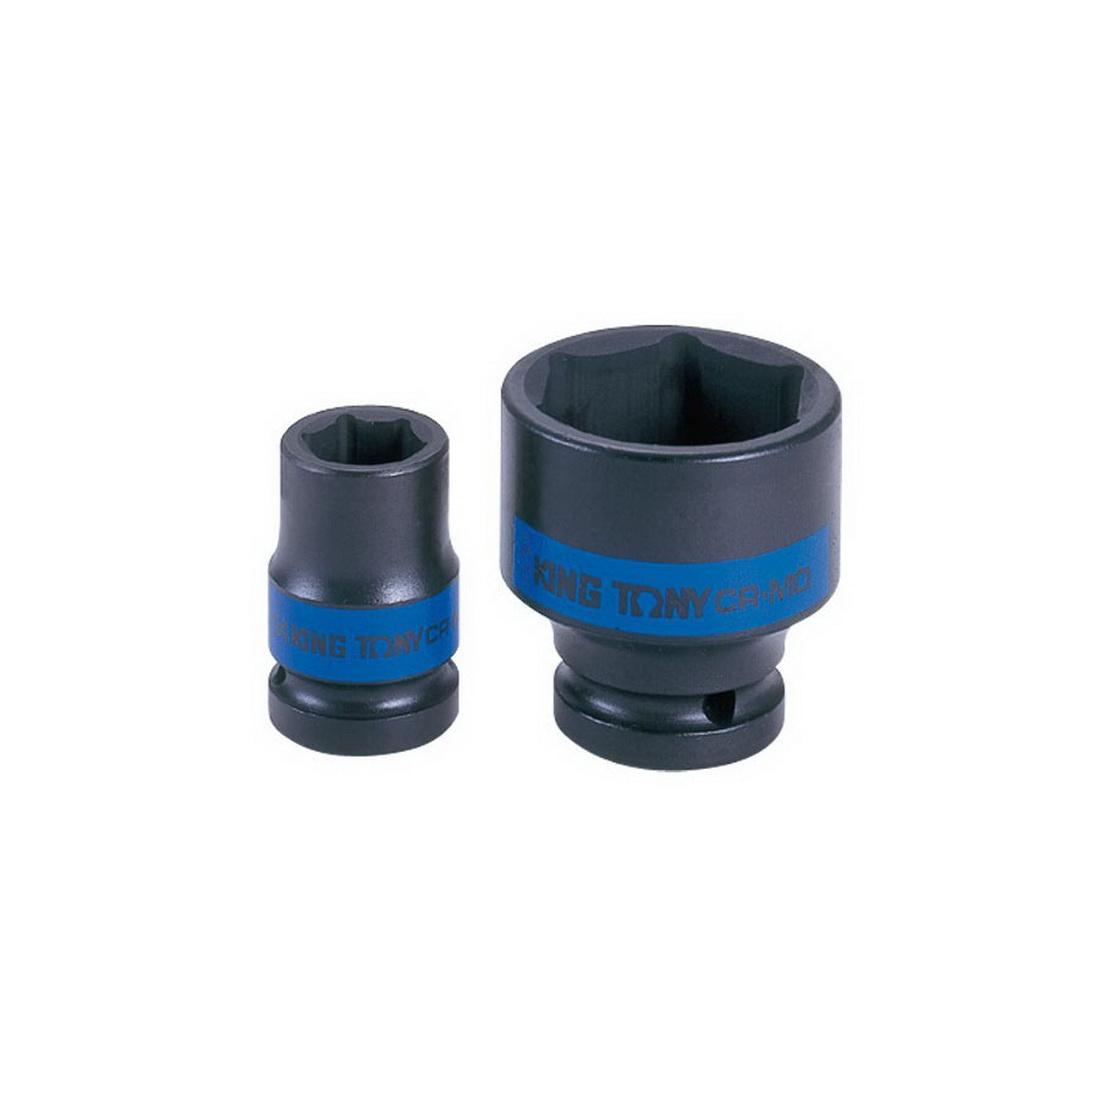 19mm 1/2 Inch Drive 6-Point Standard Impact Socket